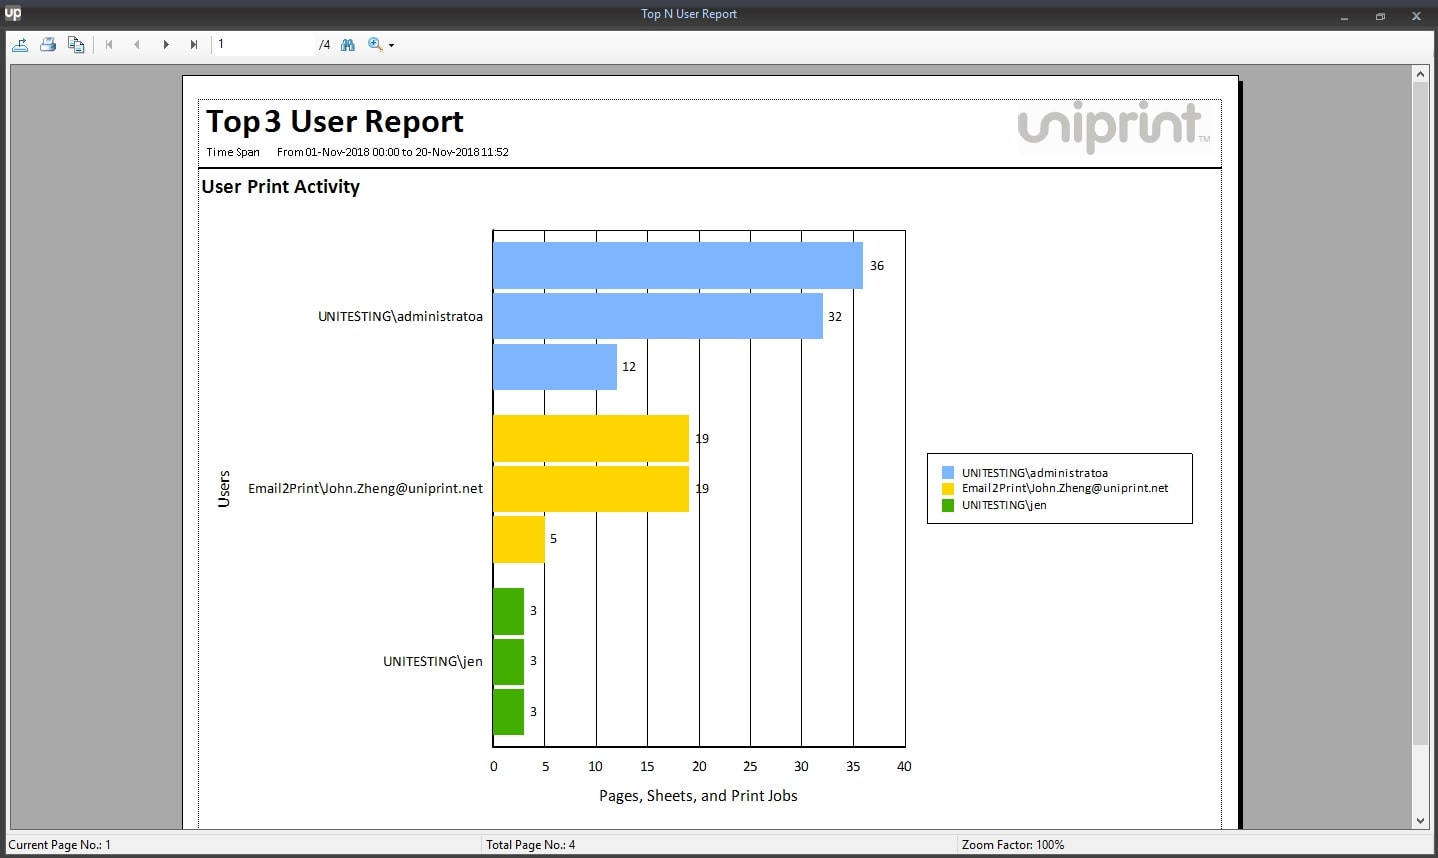 UP Print tracker tool - Print Statistics Top 3 User Report